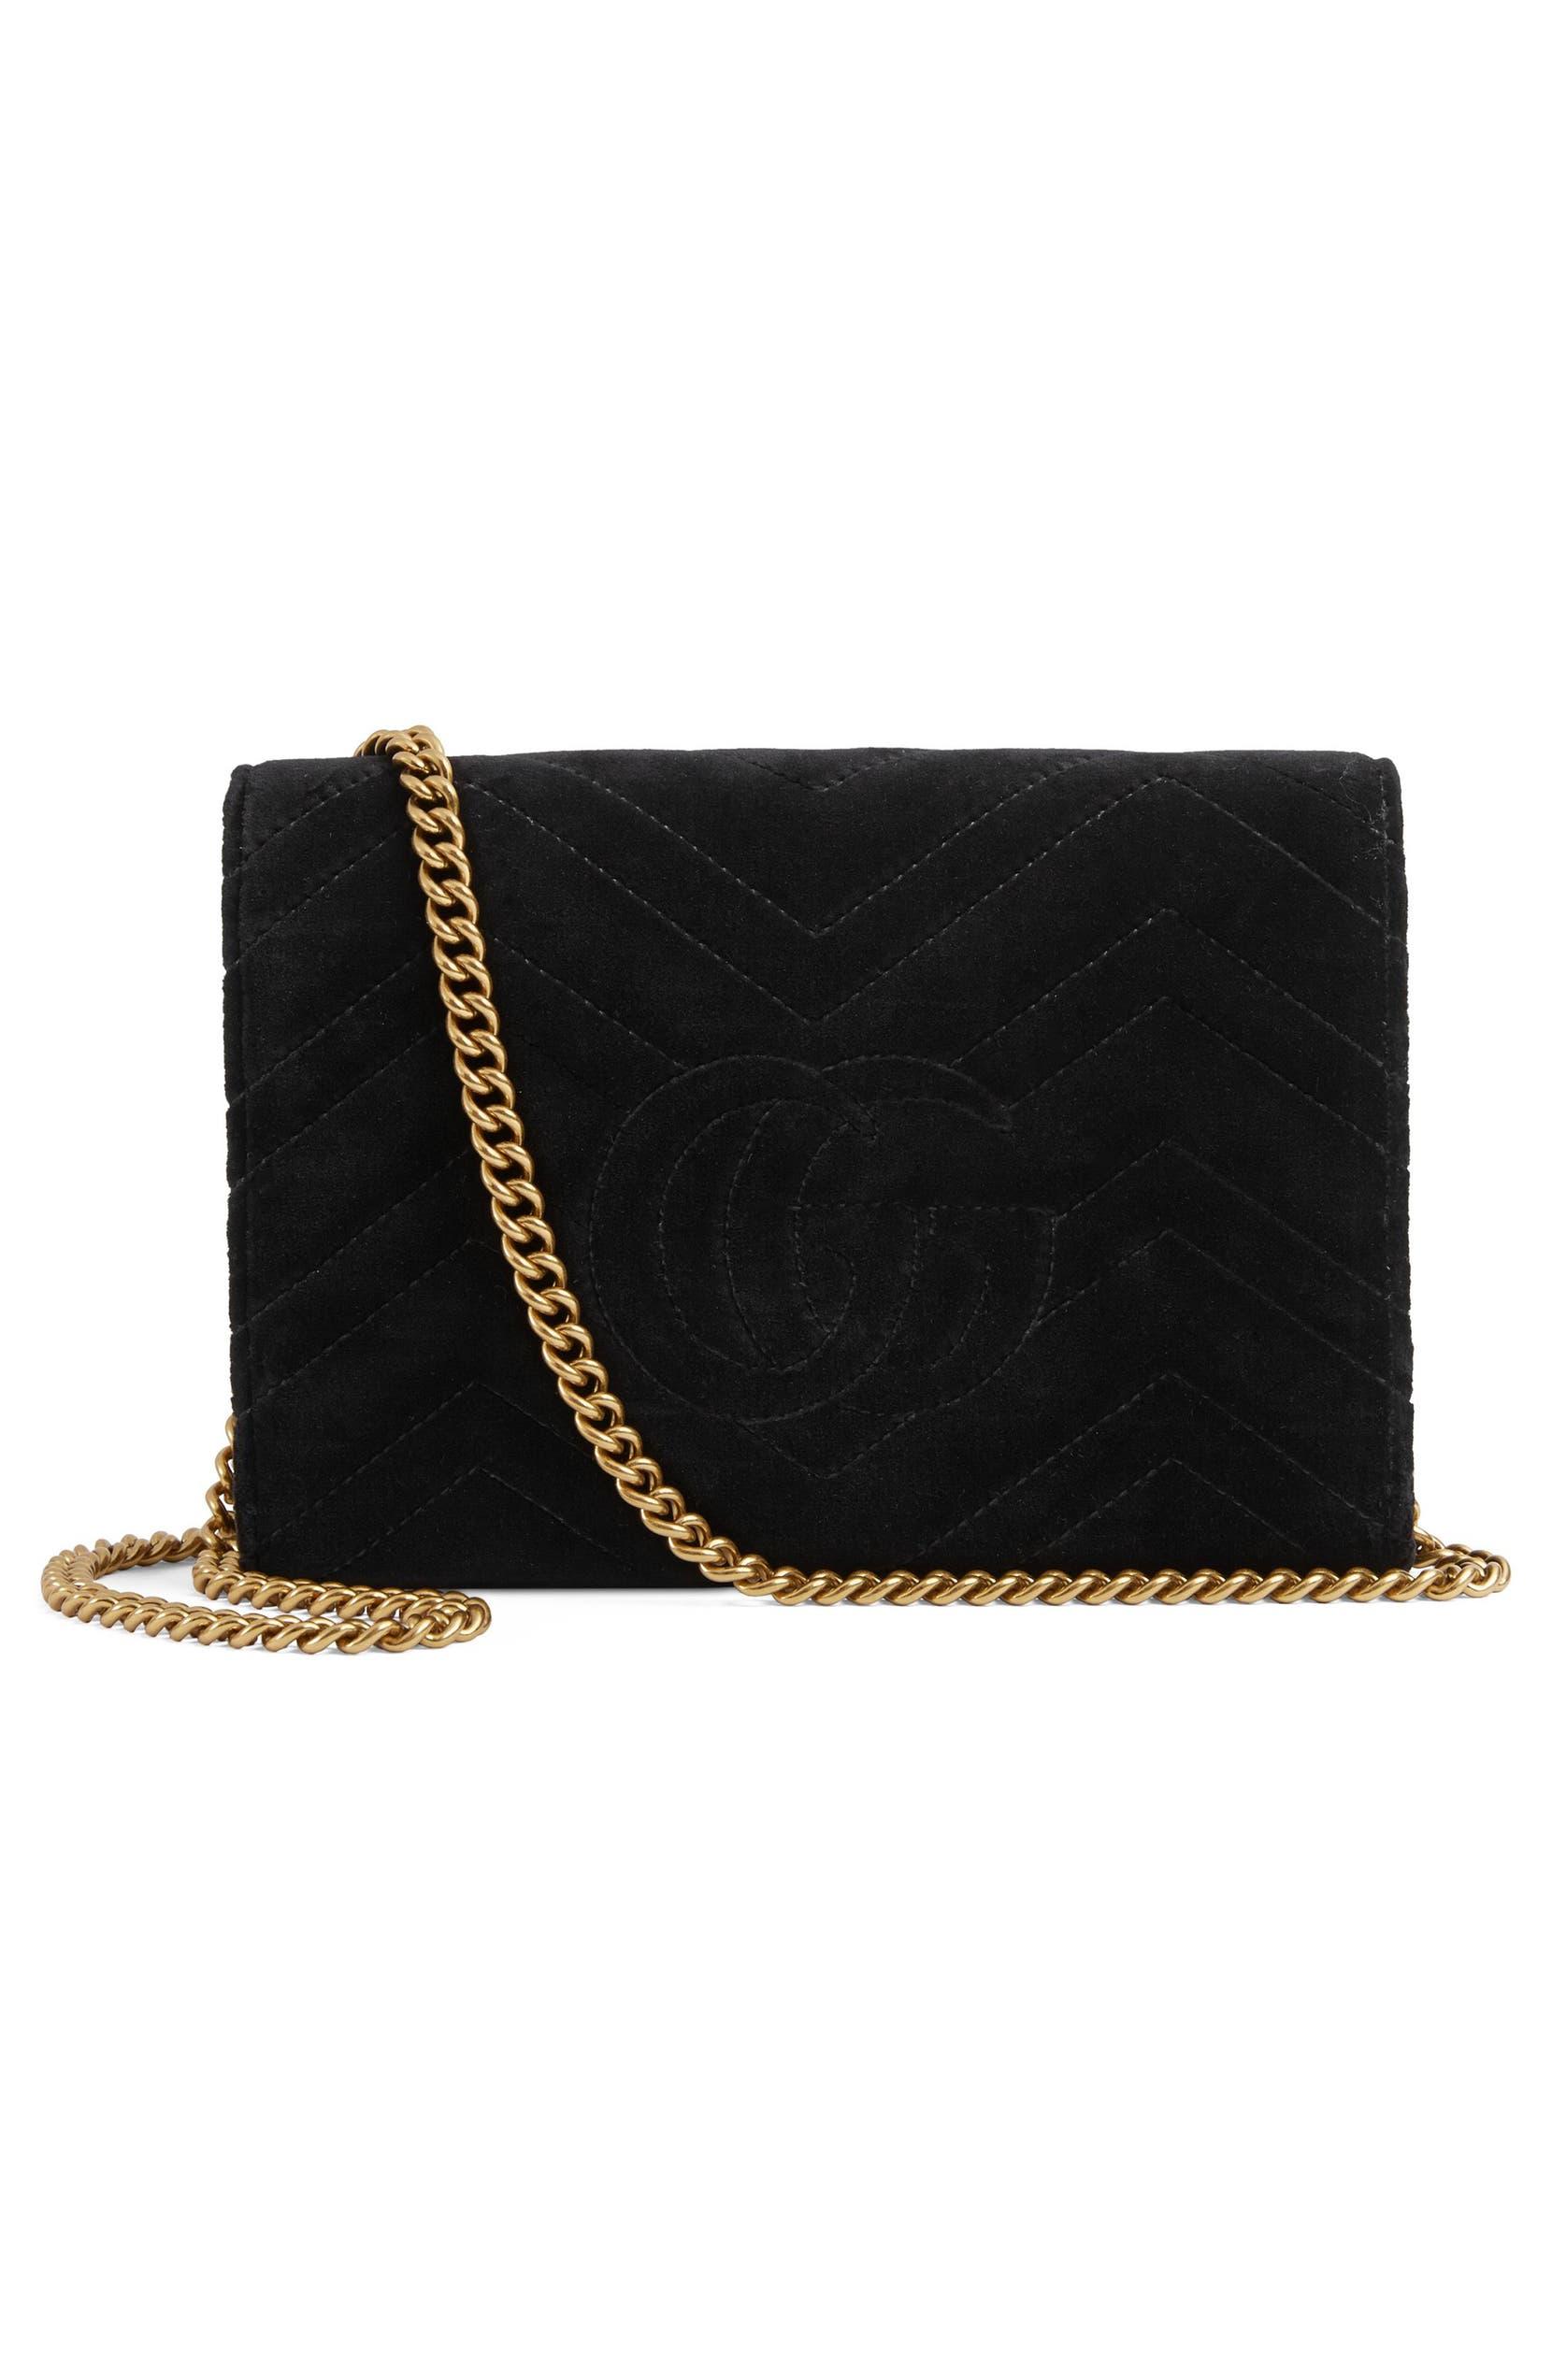 6b80959da987 Gucci GG Marmont 2.0 Matelassé Velvet Wallet on a Chain | Nordstrom